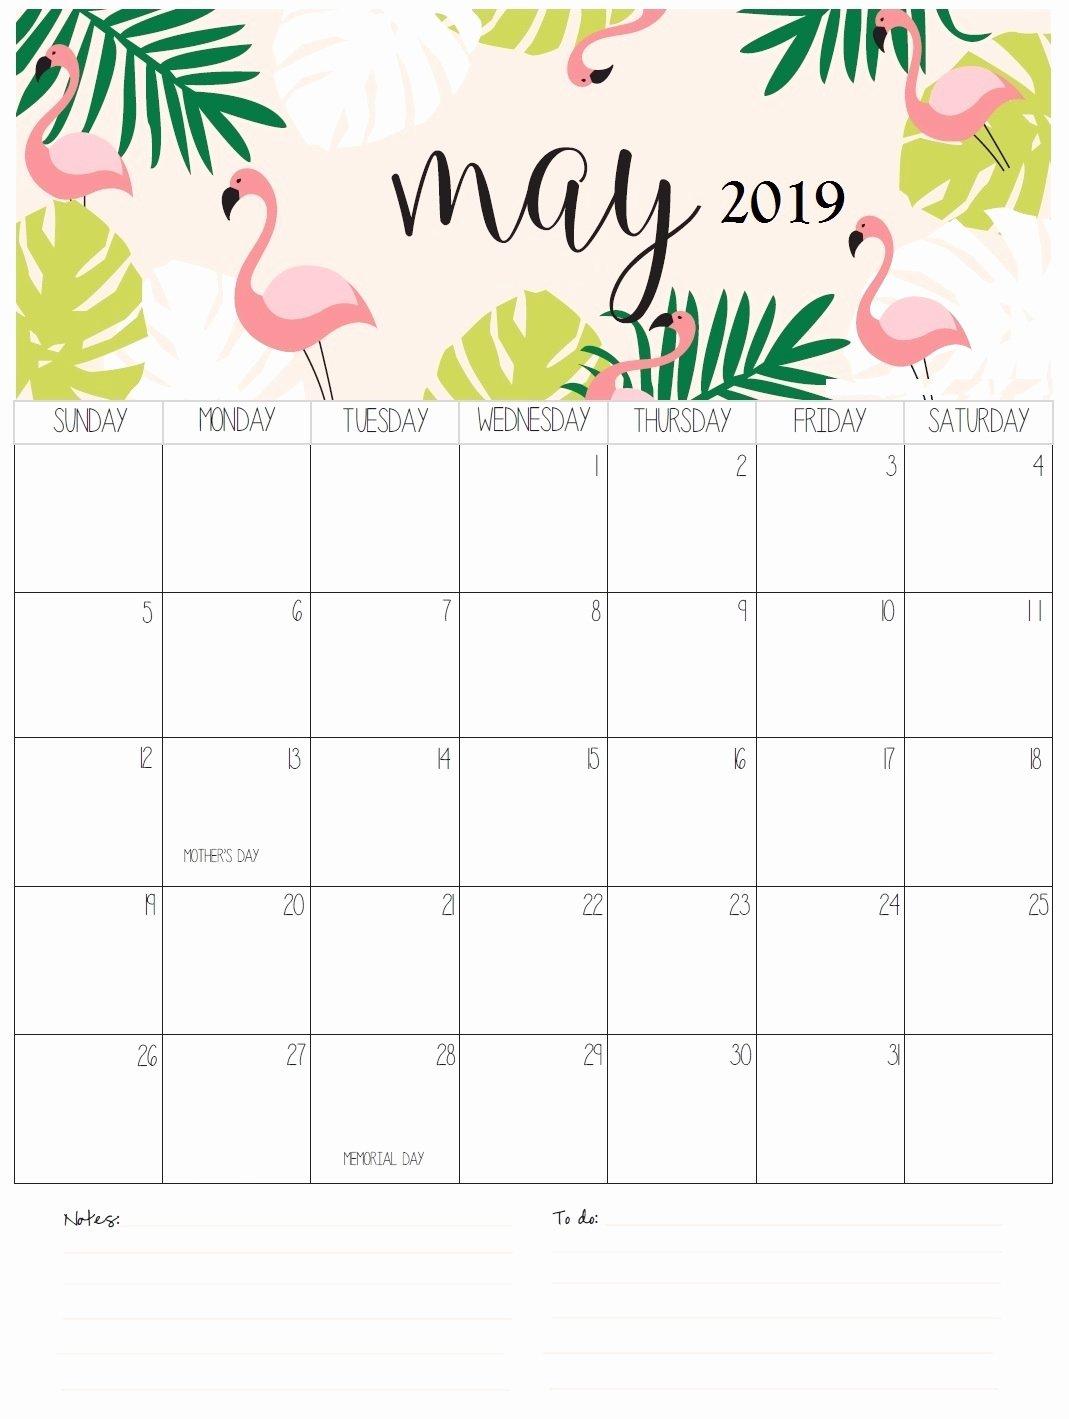 Luxury 35 Design January 2019 Calendar Printable Tumblr   Micheleboy 76Ers Calendar 2019